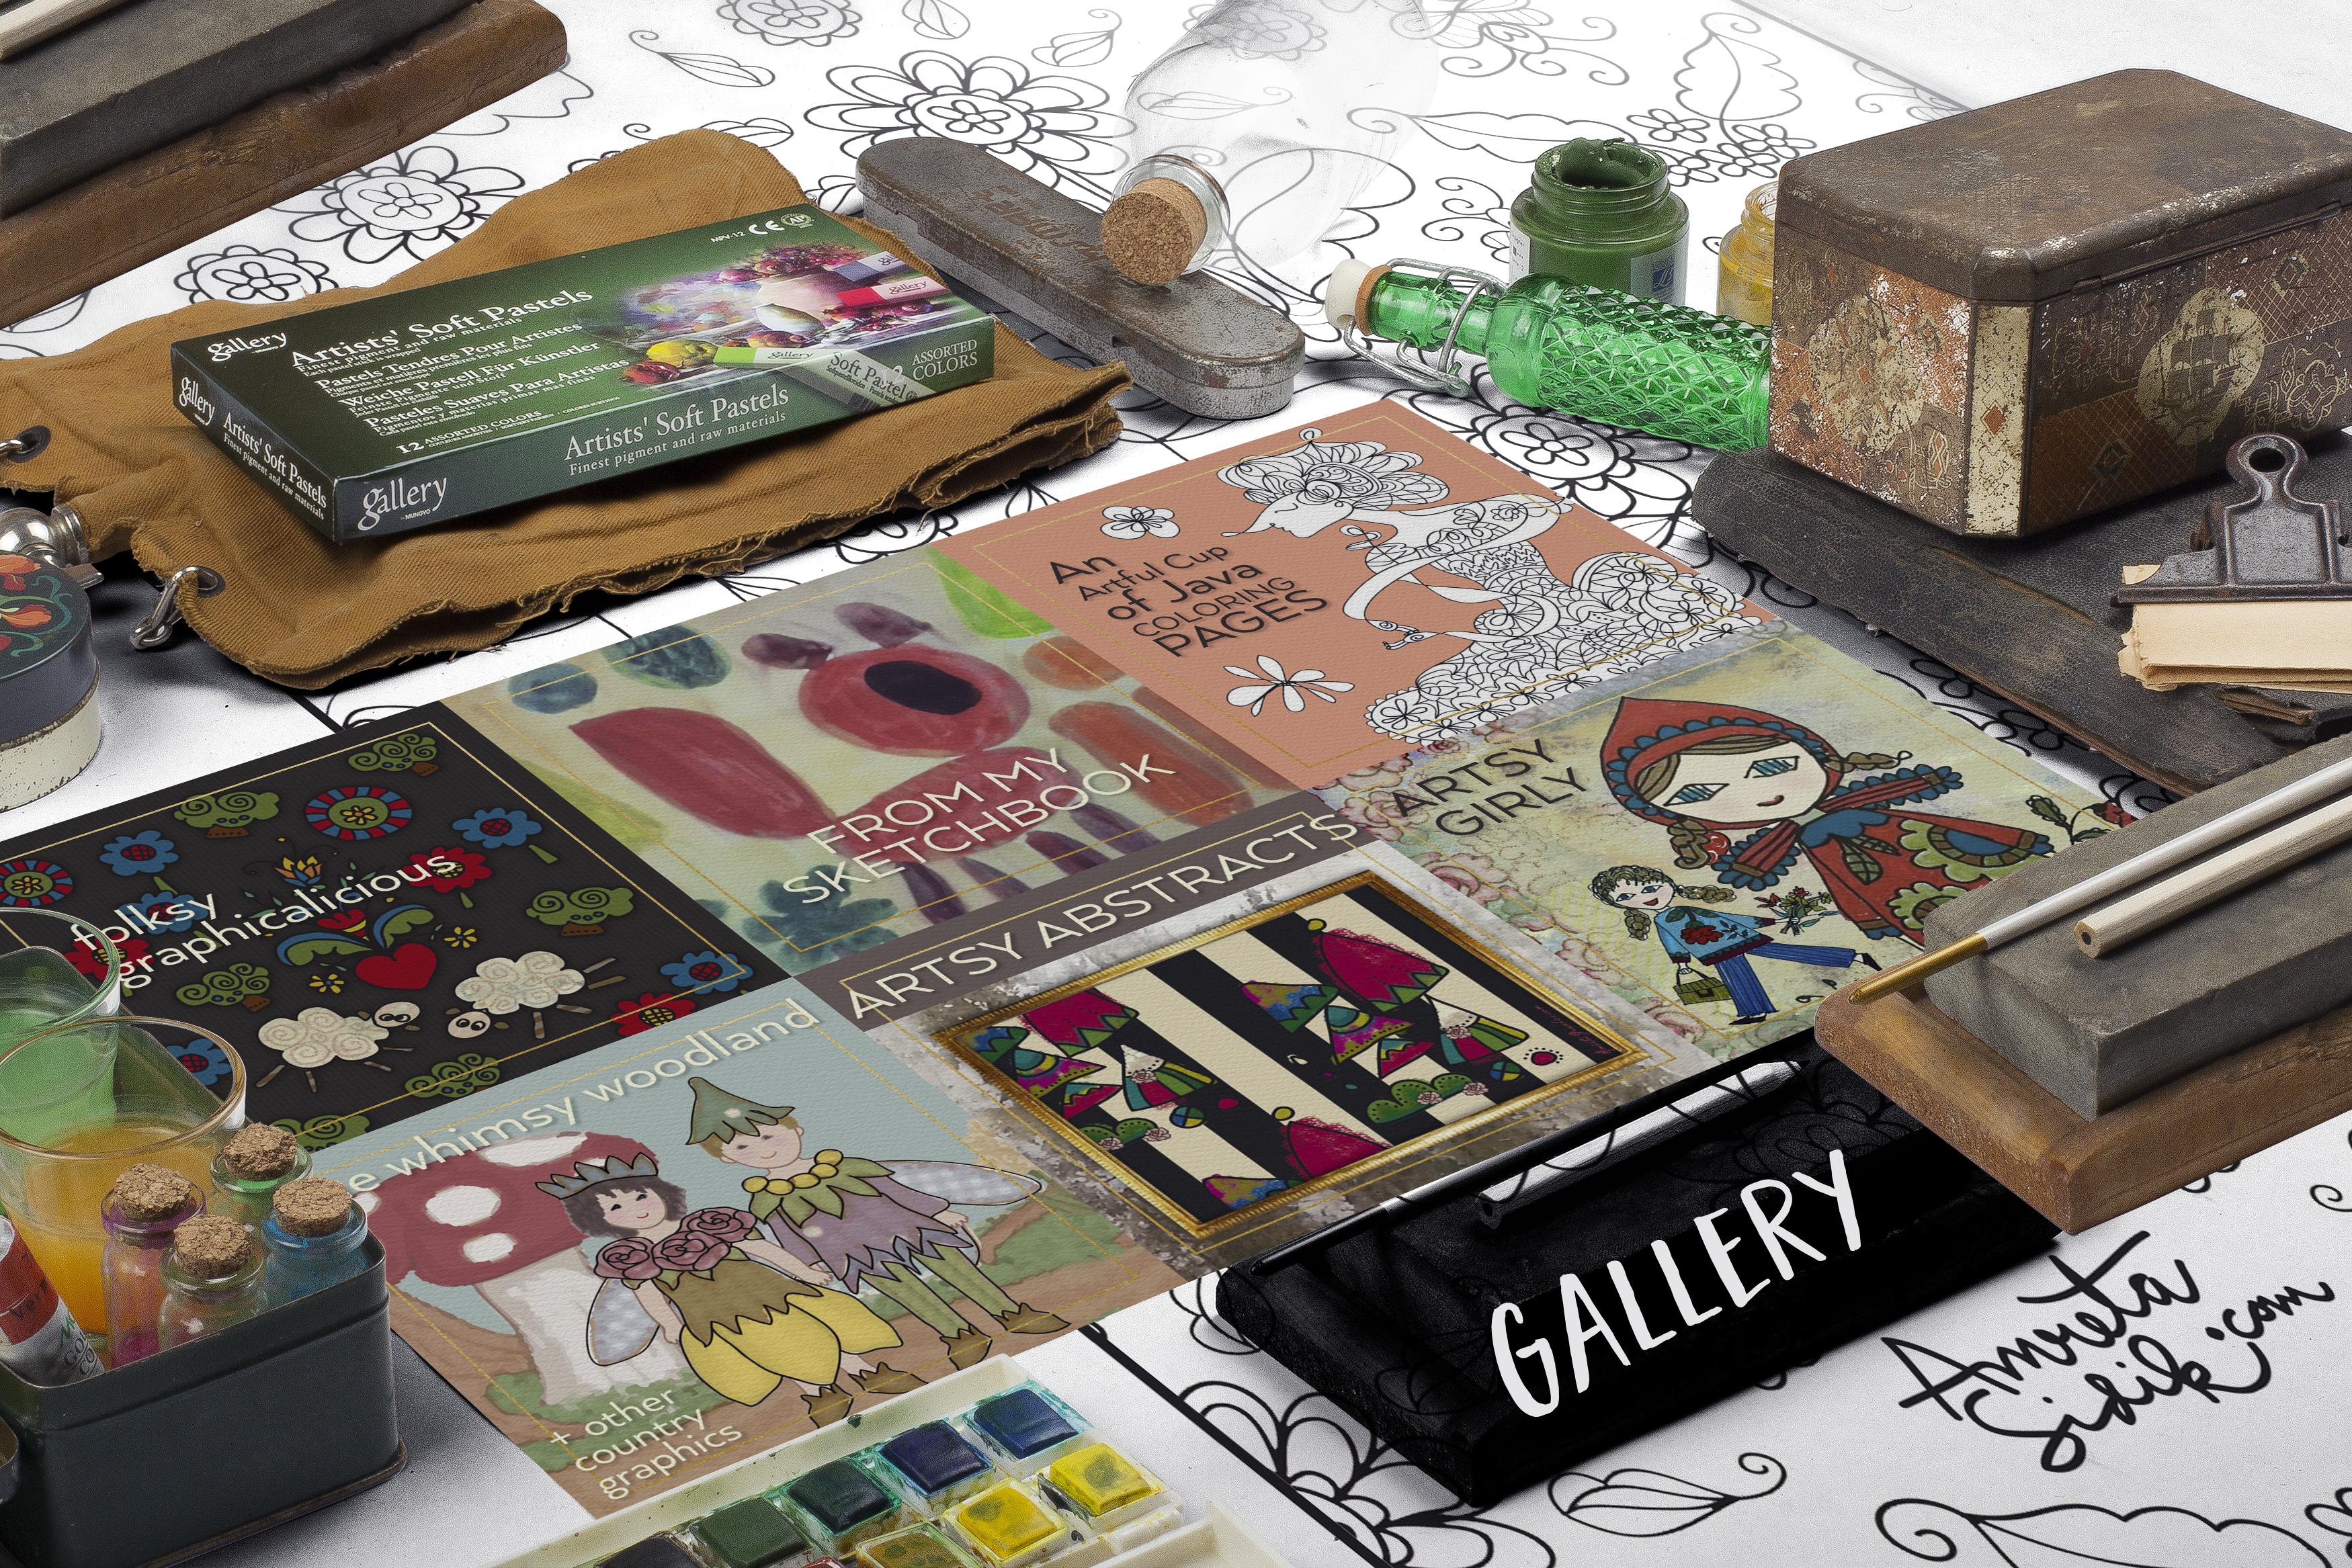 BlogMockup - 004 - gallery